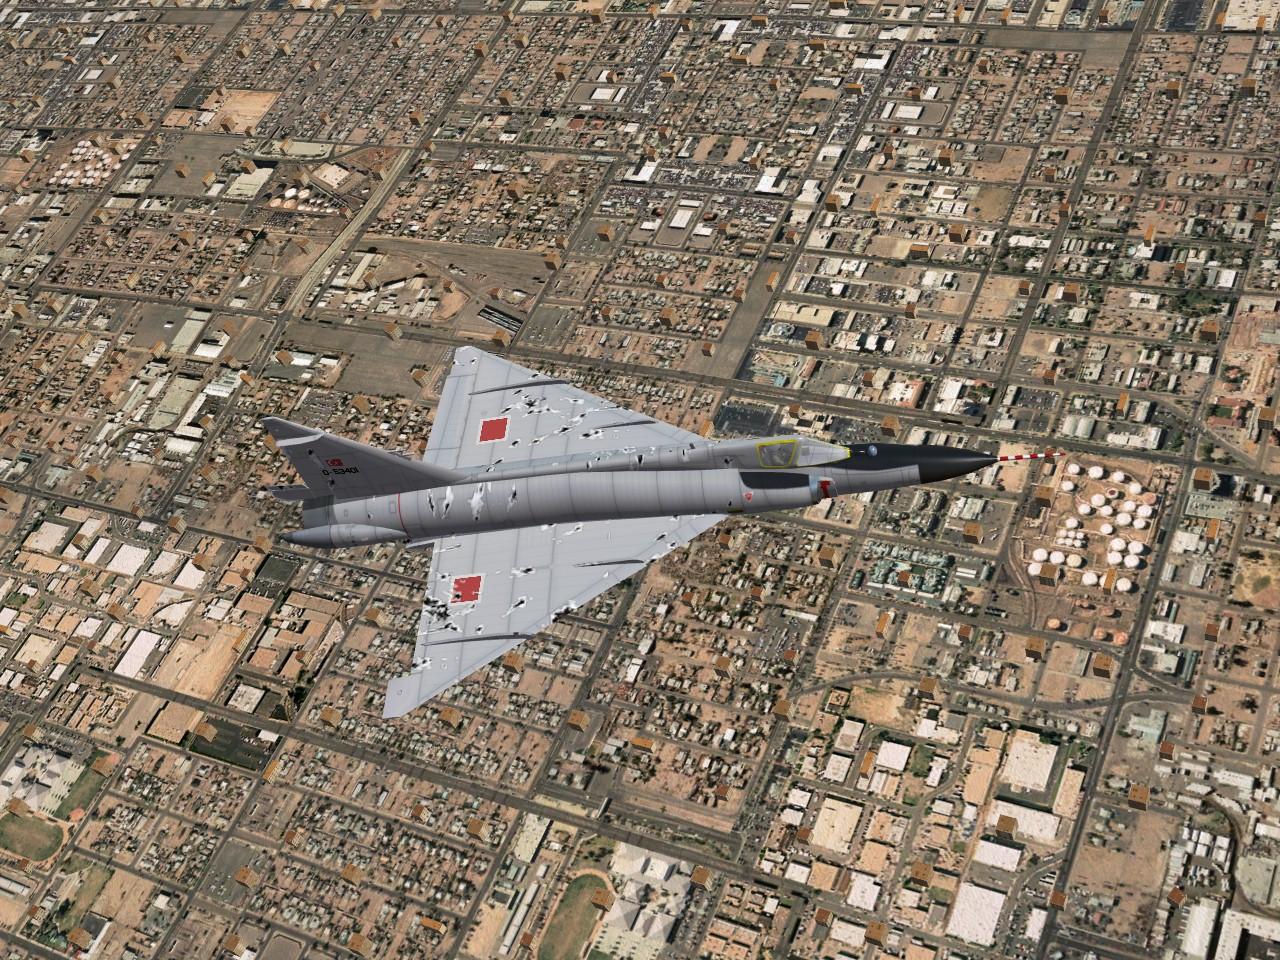 Damaged F-102